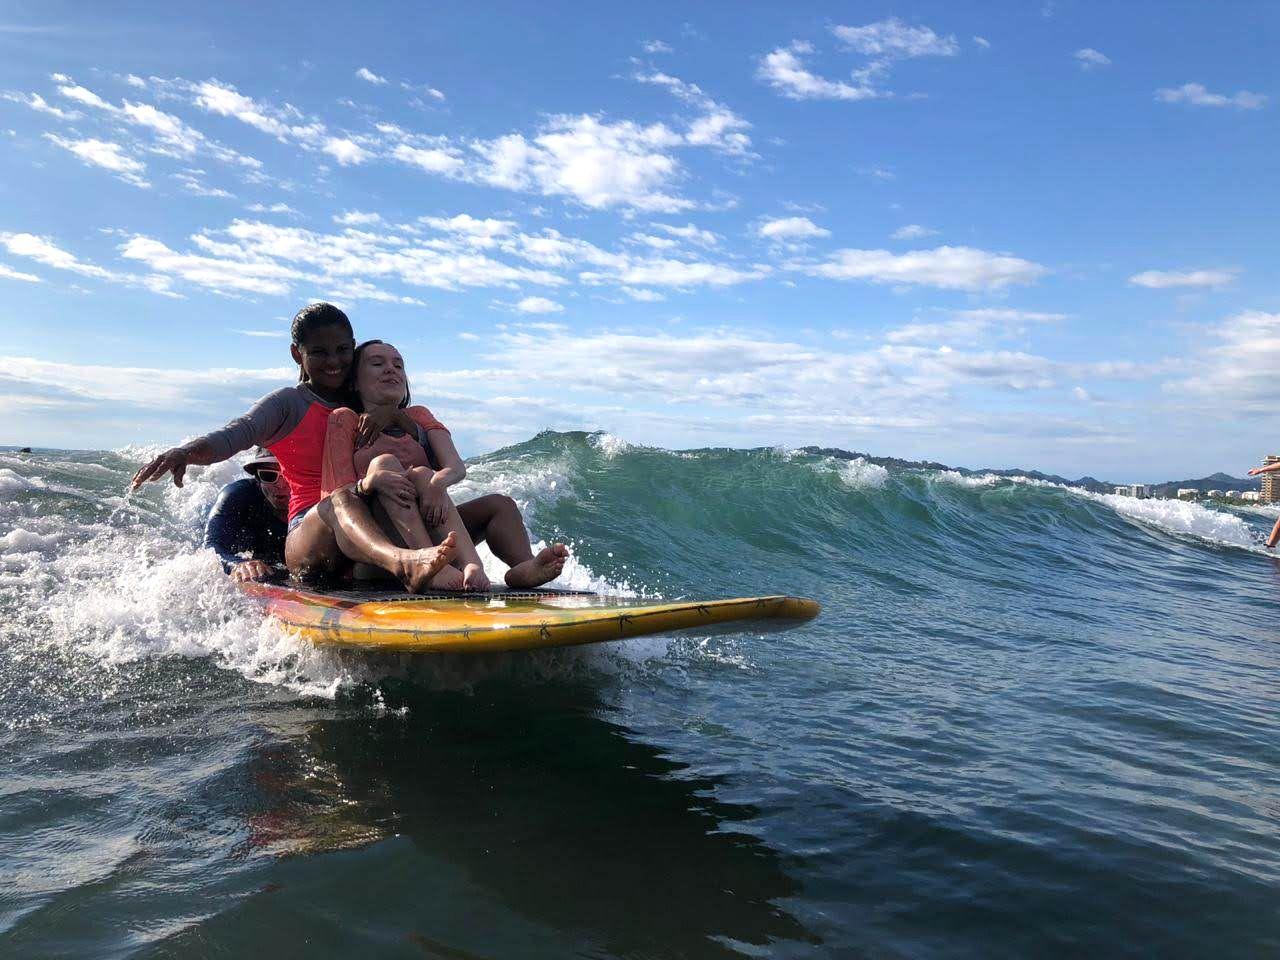 Gallery4 - 5. Beach _ Adaptive Surfing